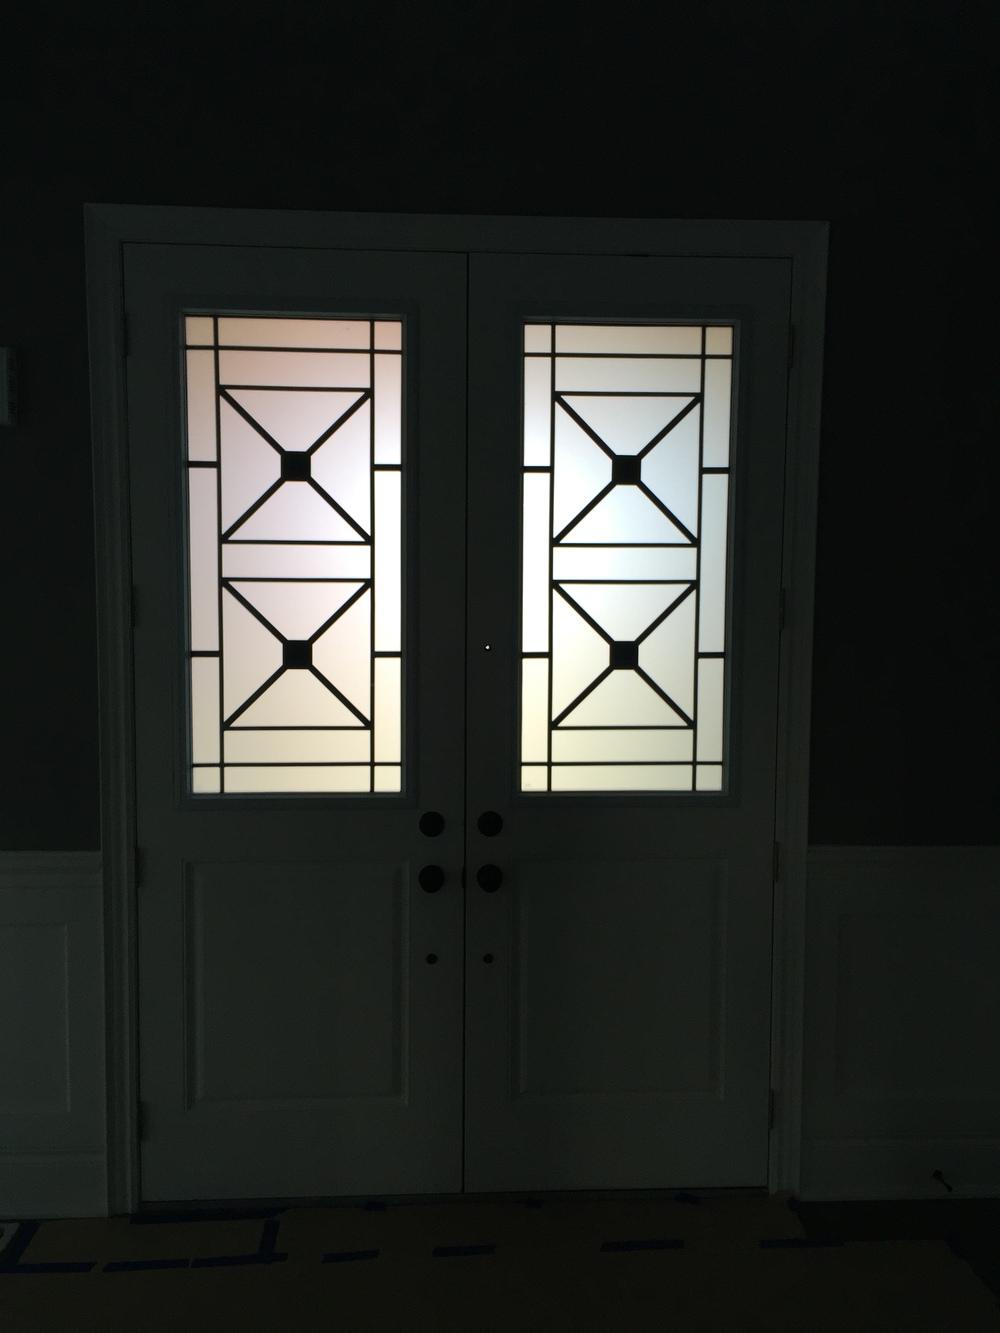 Century-Wrought-Iron-Glass-Door-Inserts-Brampton-Ontario